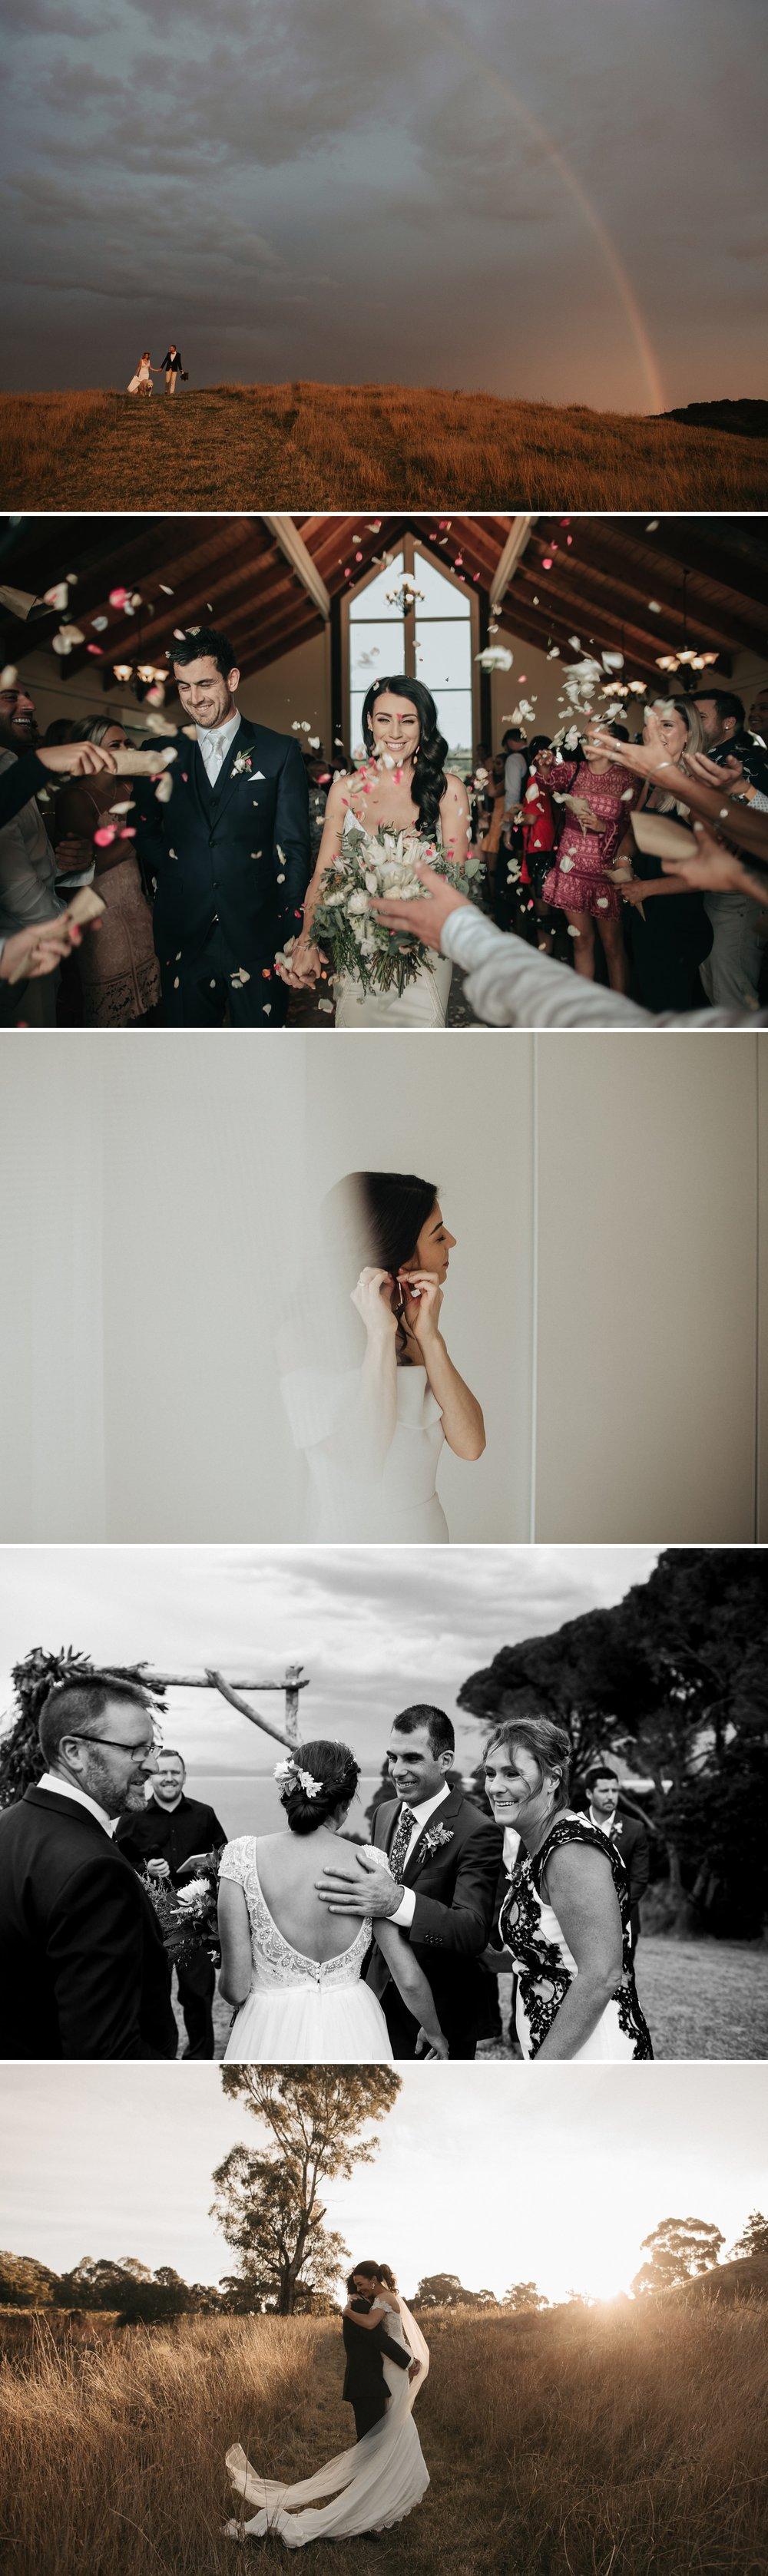 relaxed-wedding-photographer-melbourne_0027.jpg